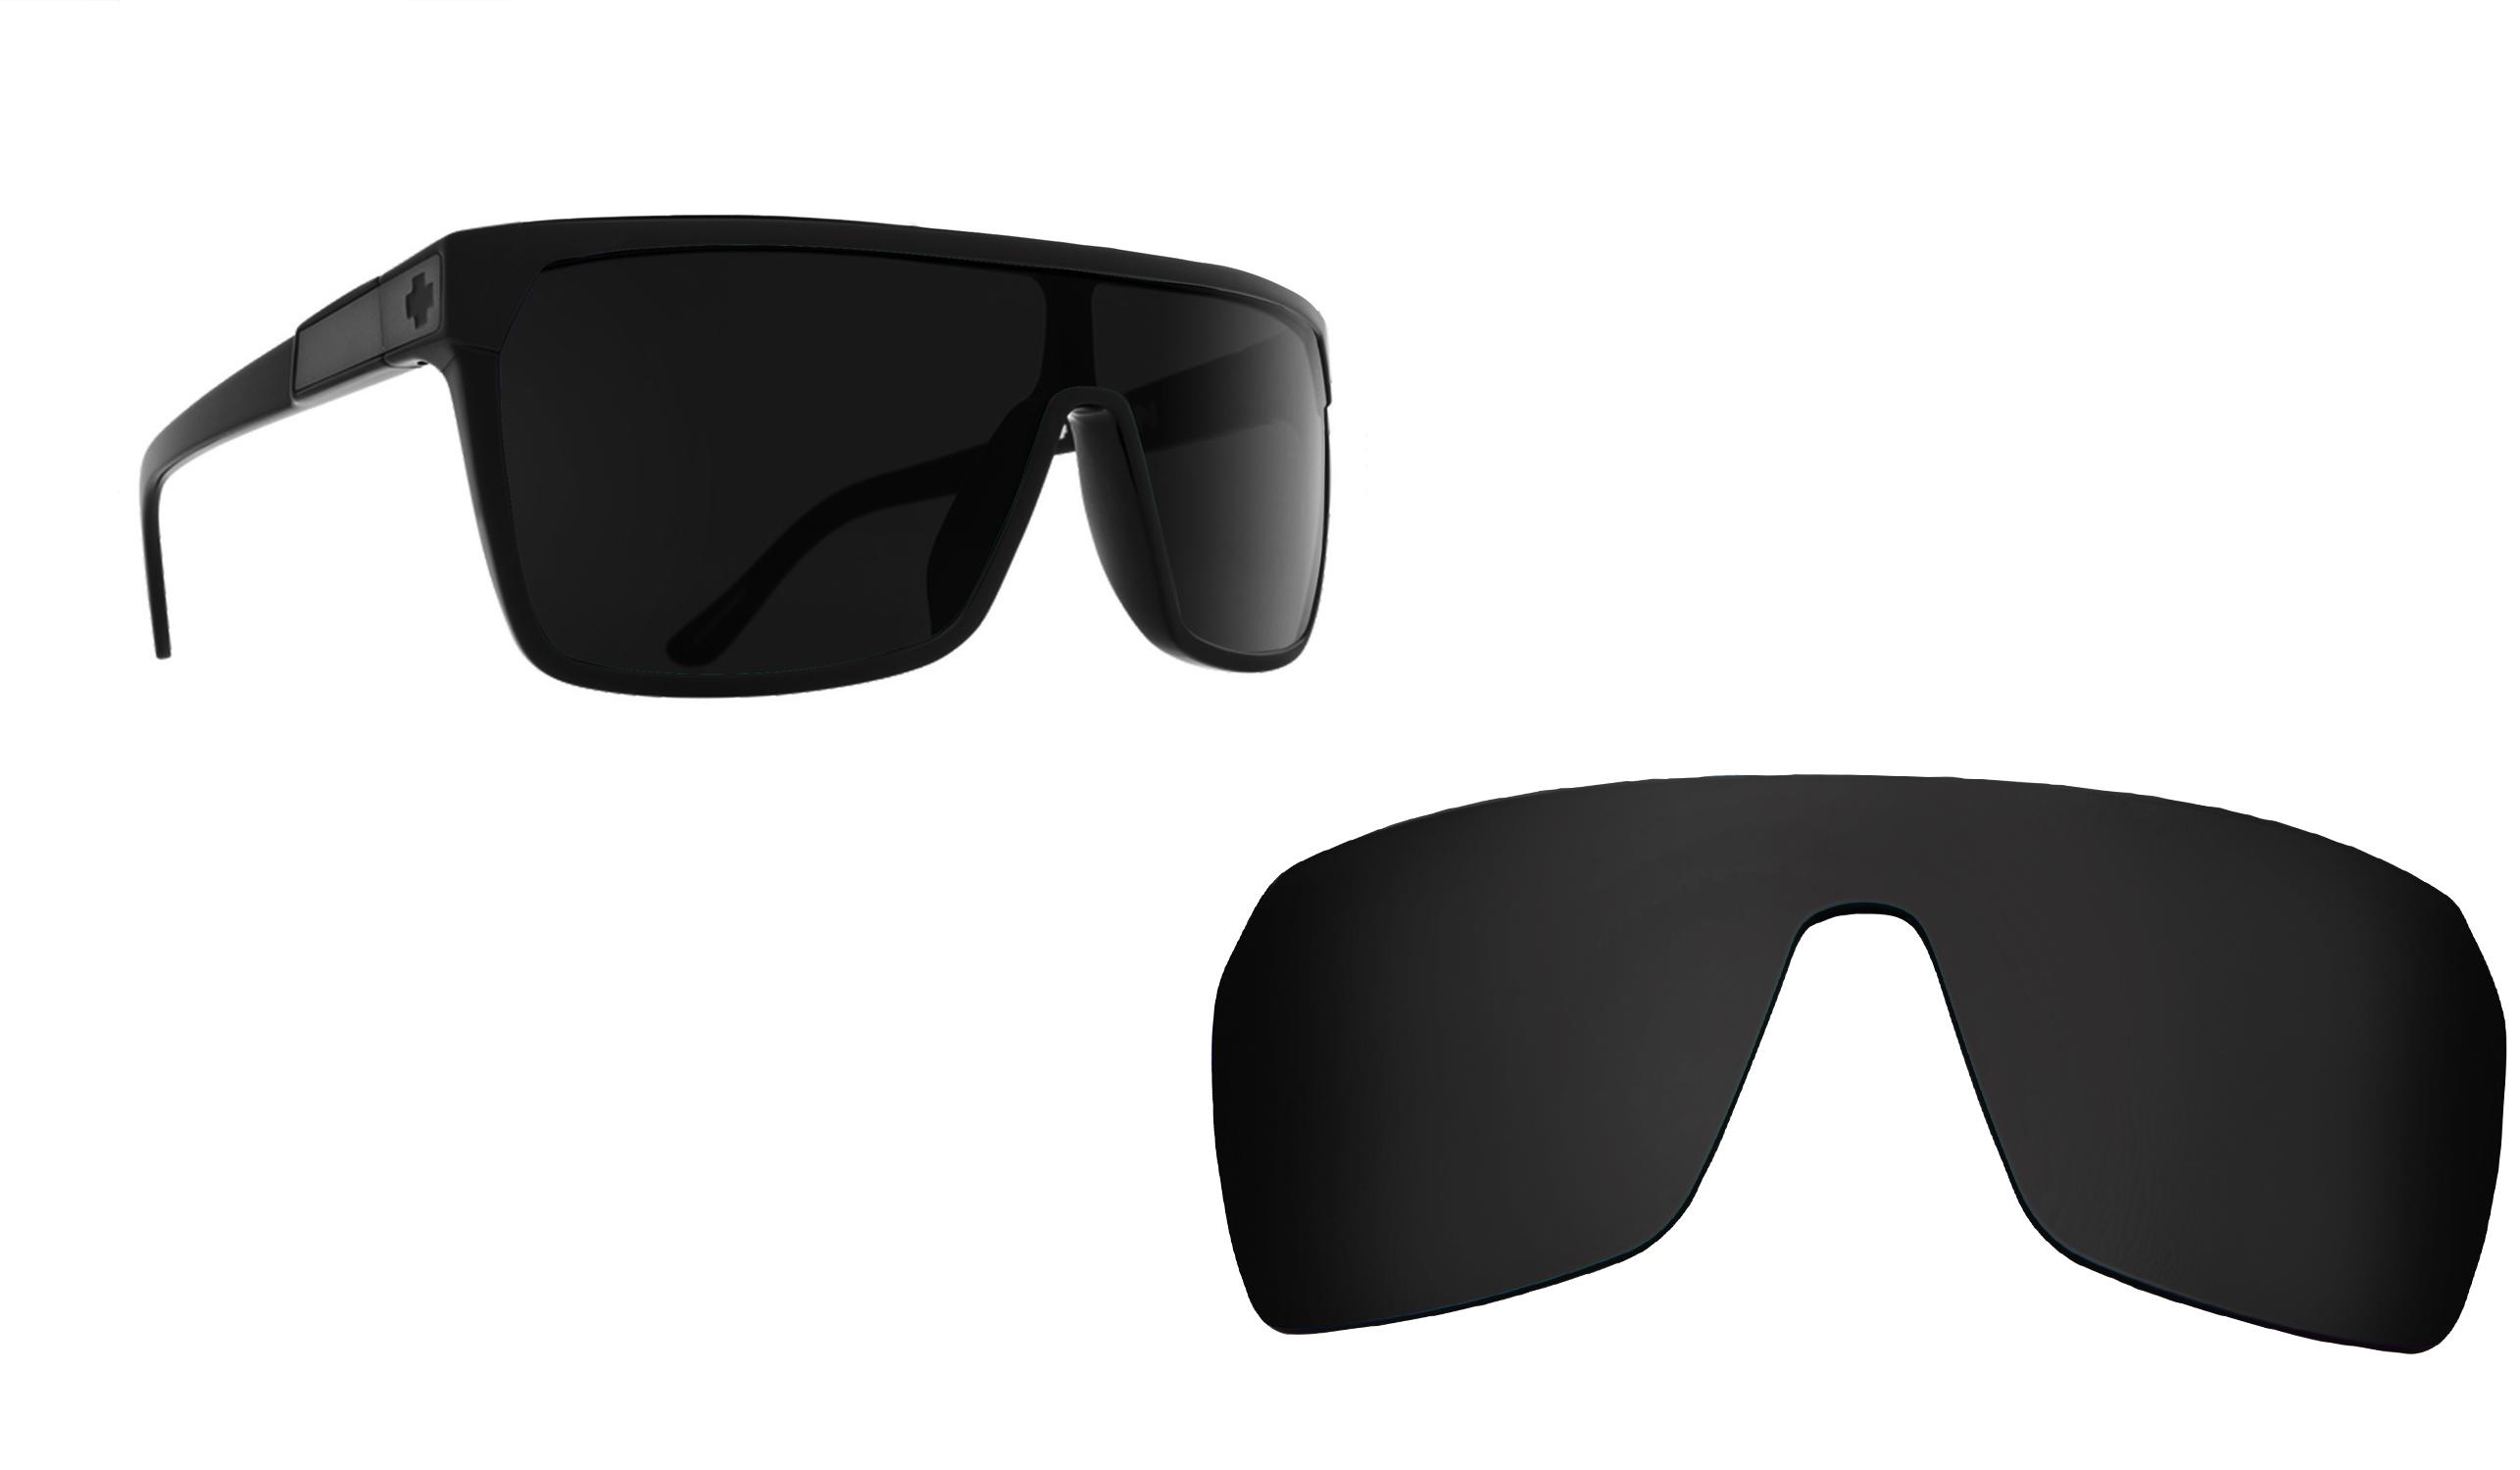 0c9d31787d Flynn Replacement Lenses by SEEK OPTICS to fit SPY OPTICS Sunglasses ...